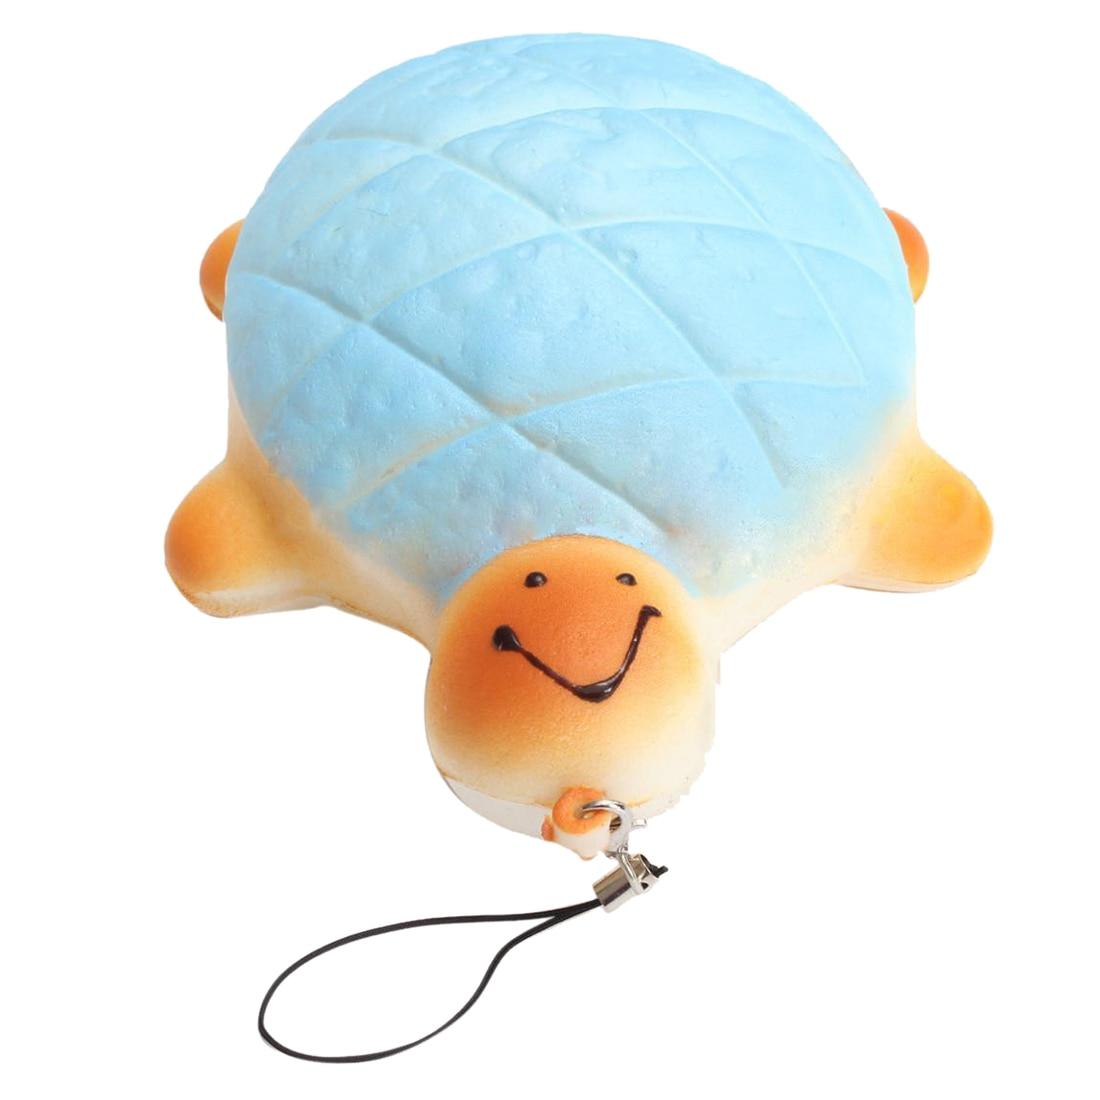 Plafonnier Salle De Bain Jumbo ~ abwe meilleur vente 1 pc 13 cm tortue tortue jumbo pendentif